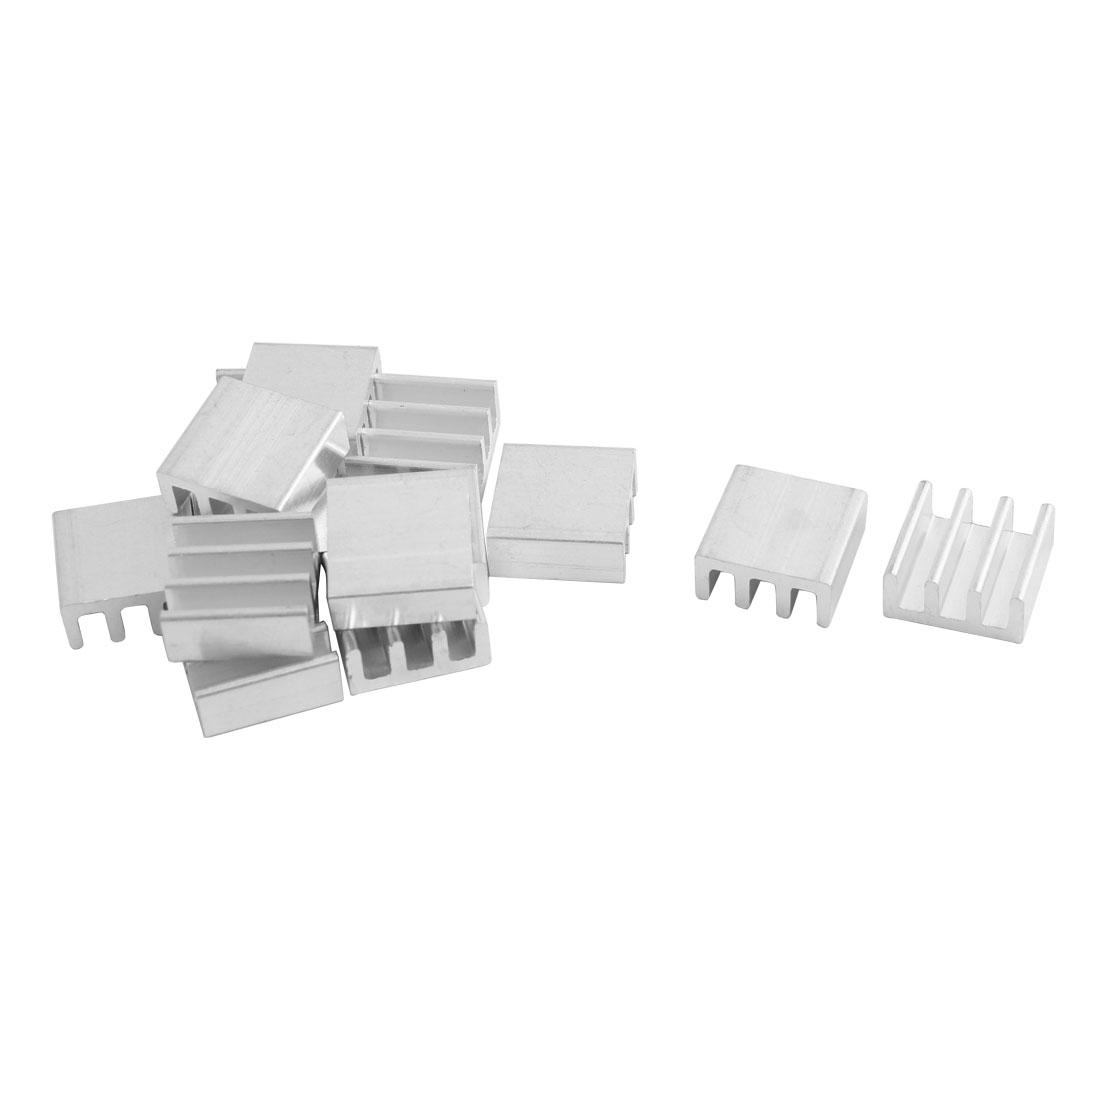 Computer Aluminum Heatsink Cooling Fin Cooler Silver Tone 11mm x 11mm x 5mm 14pcs